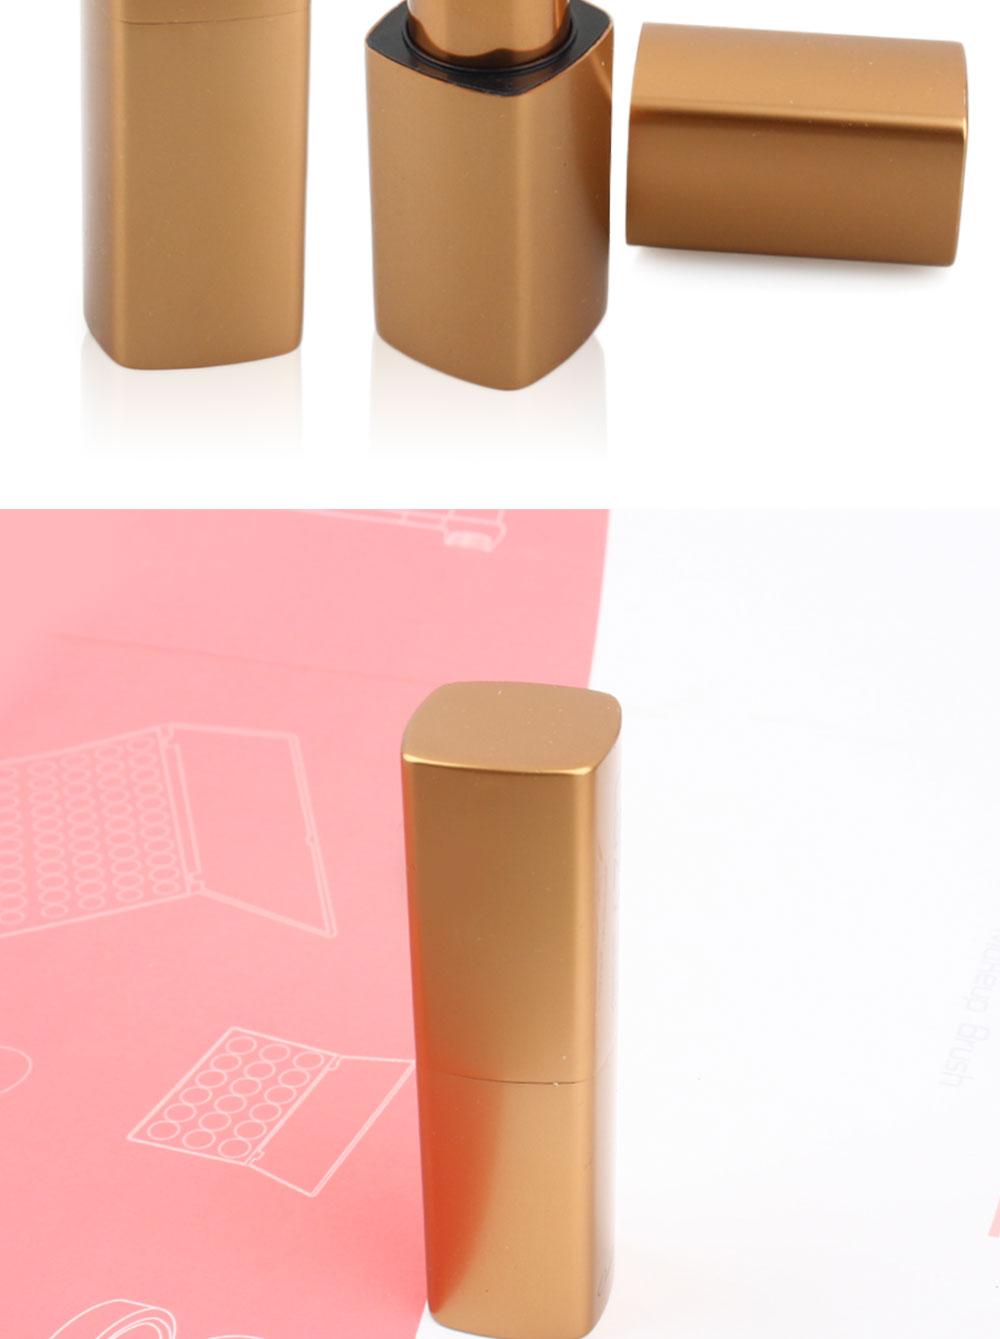 2017 OEM 로고 립글로스 채식주의 립스틱 화장품 메이크업 립 스틱